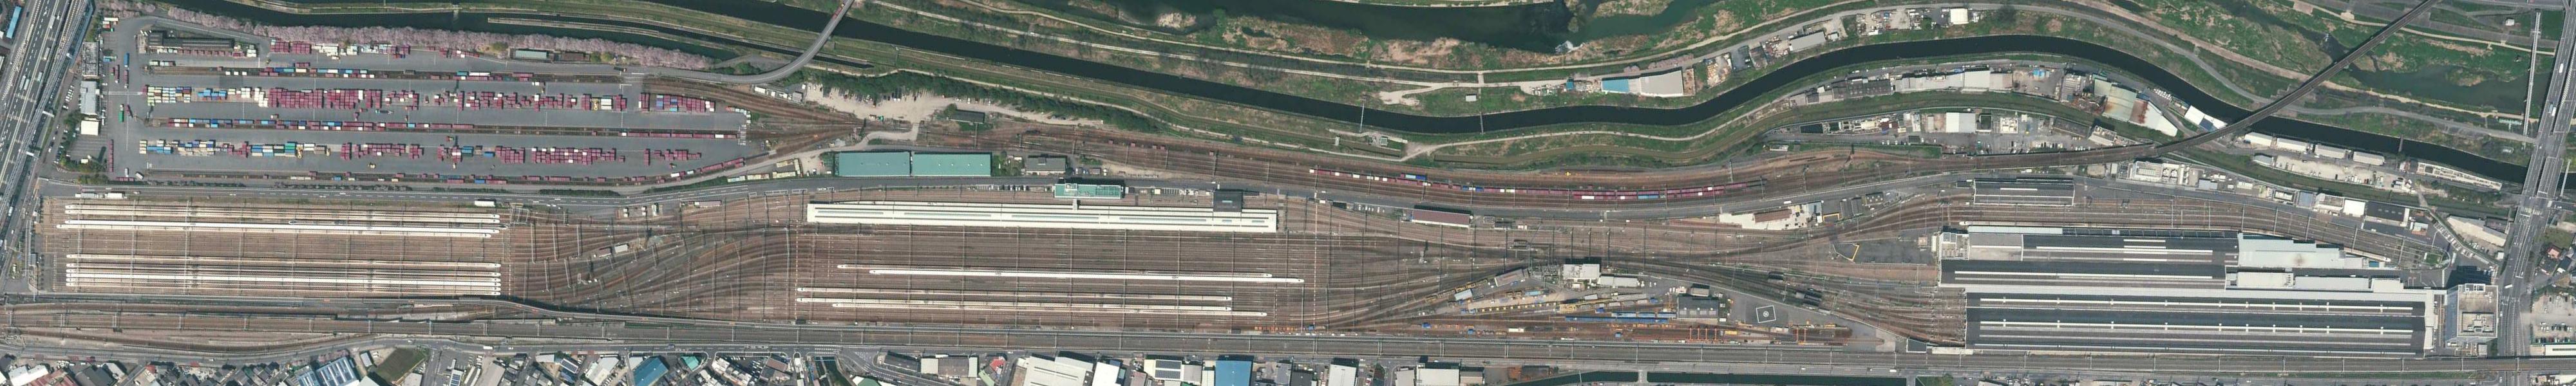 https://upload.wikimedia.org/wikipedia/commons/e/eb/Torikai_Rail_Yard.2017.jpg